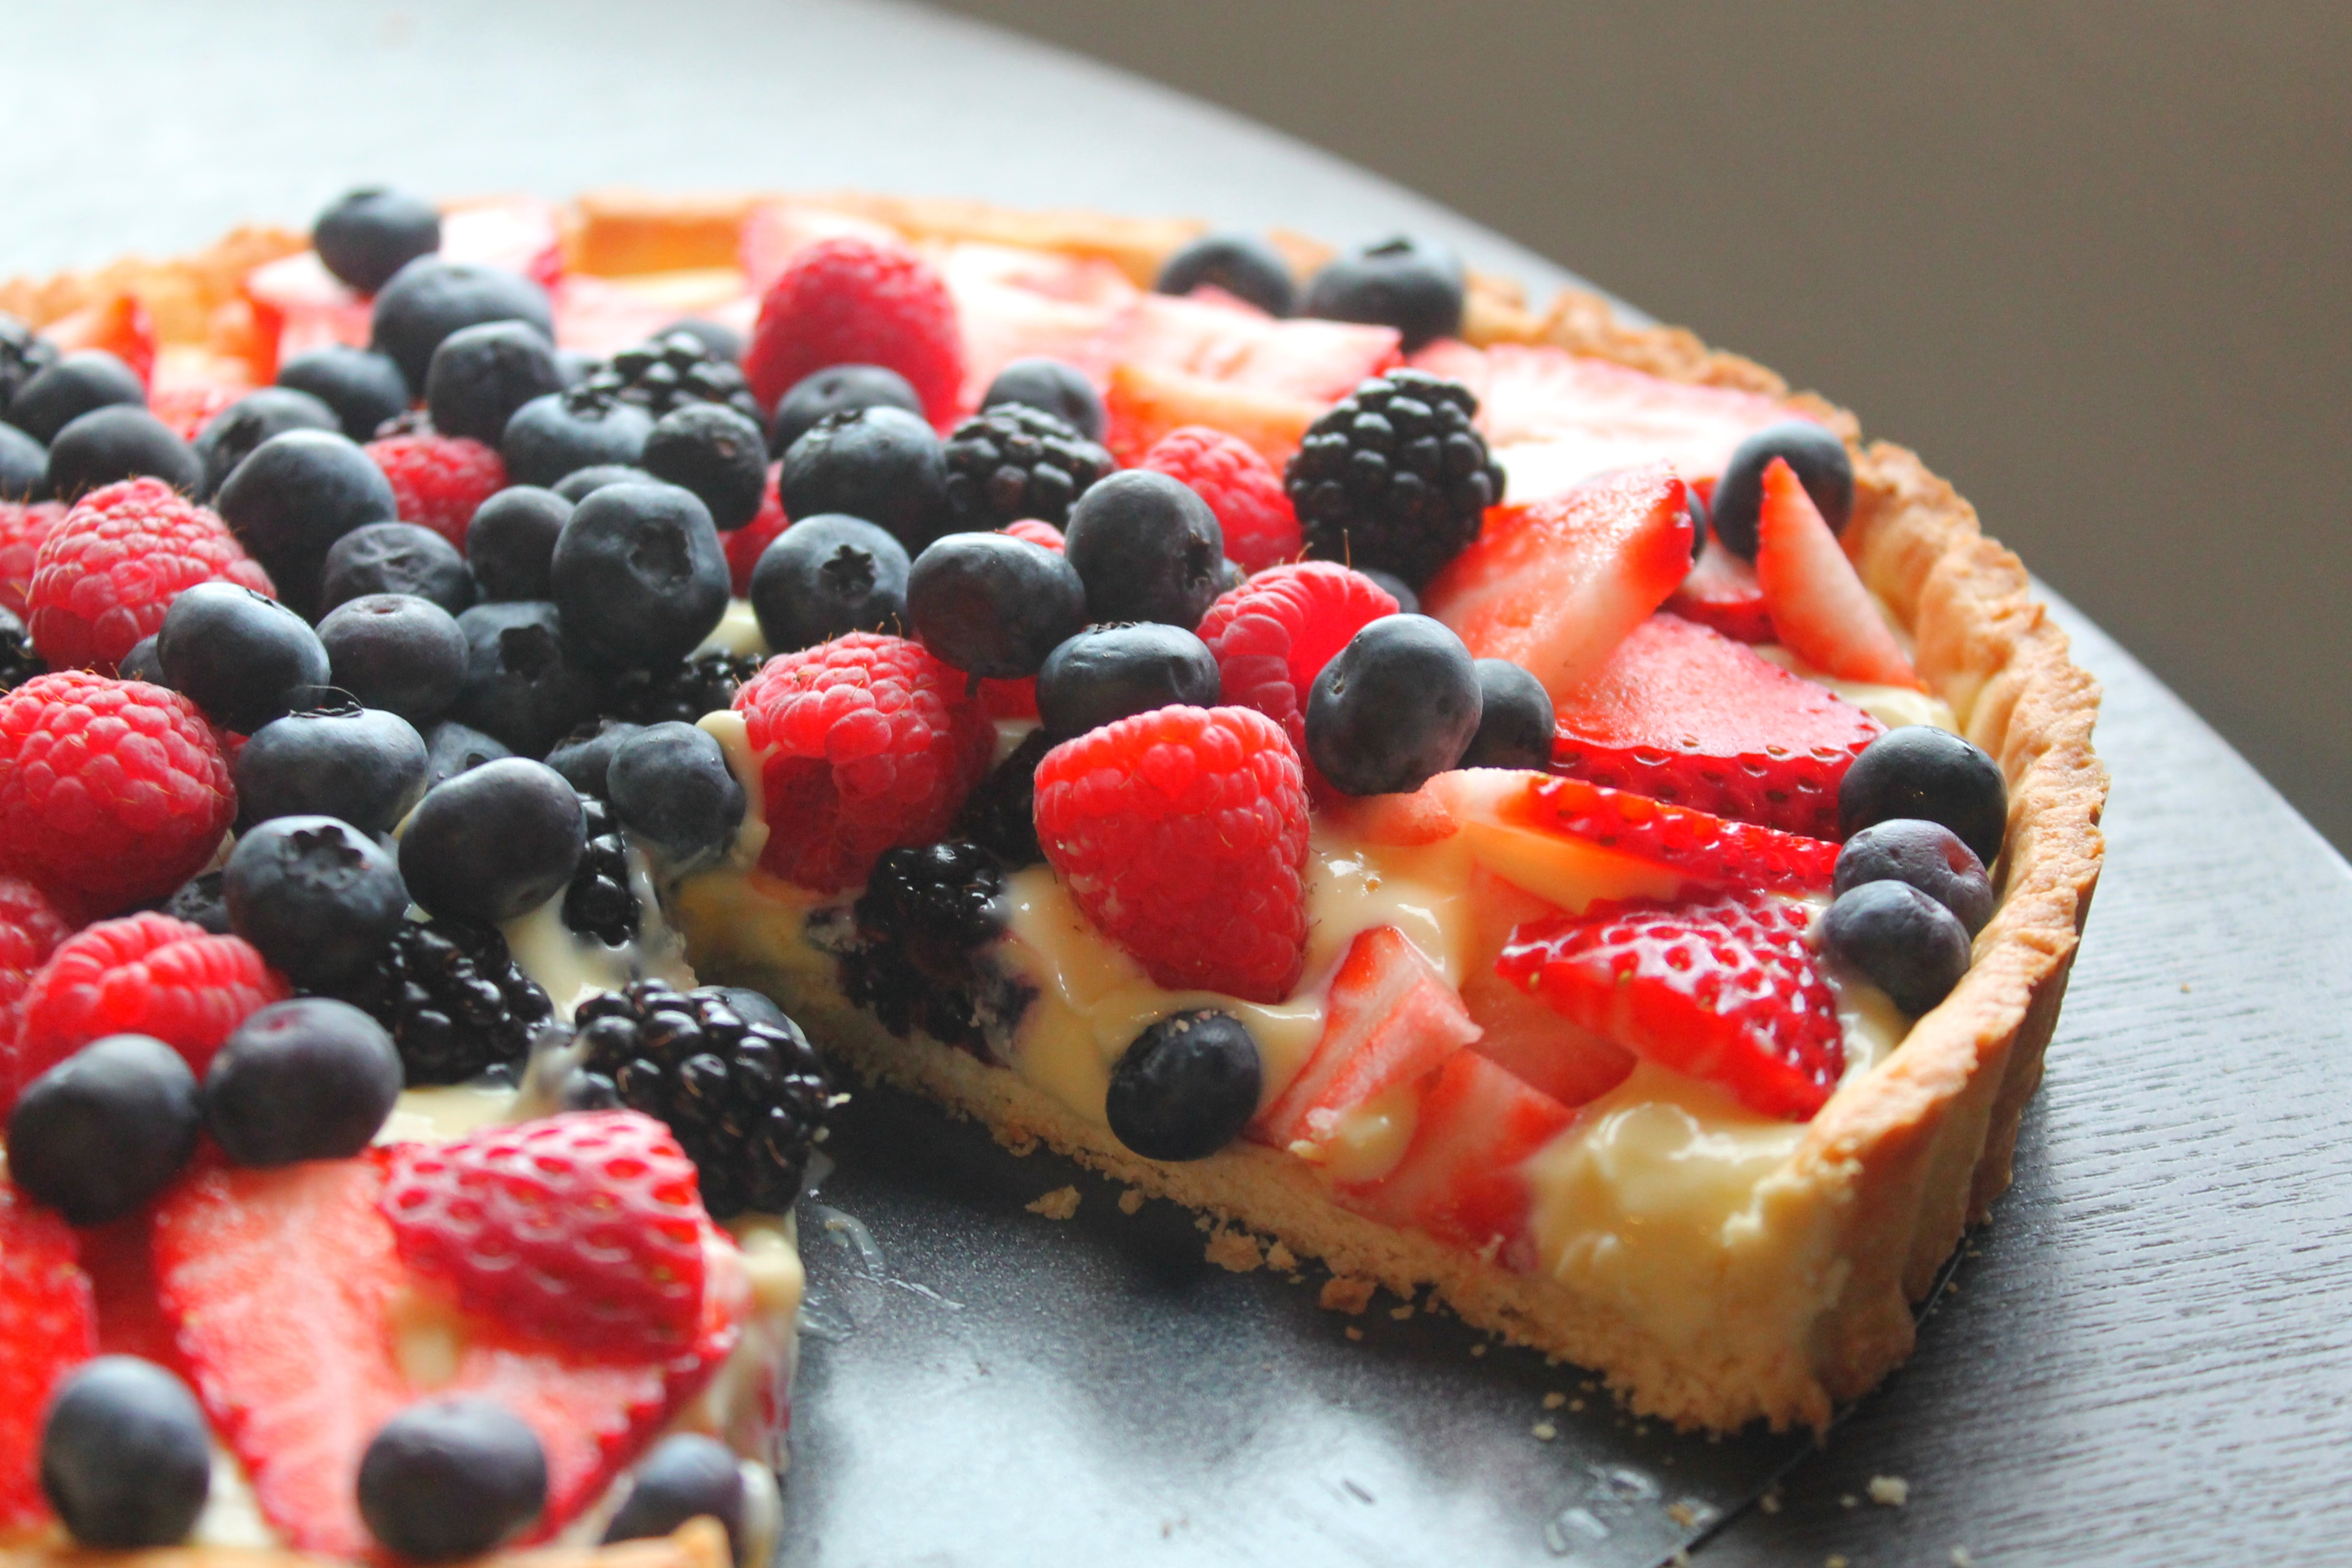 Fruit Tart with Fresh Berries